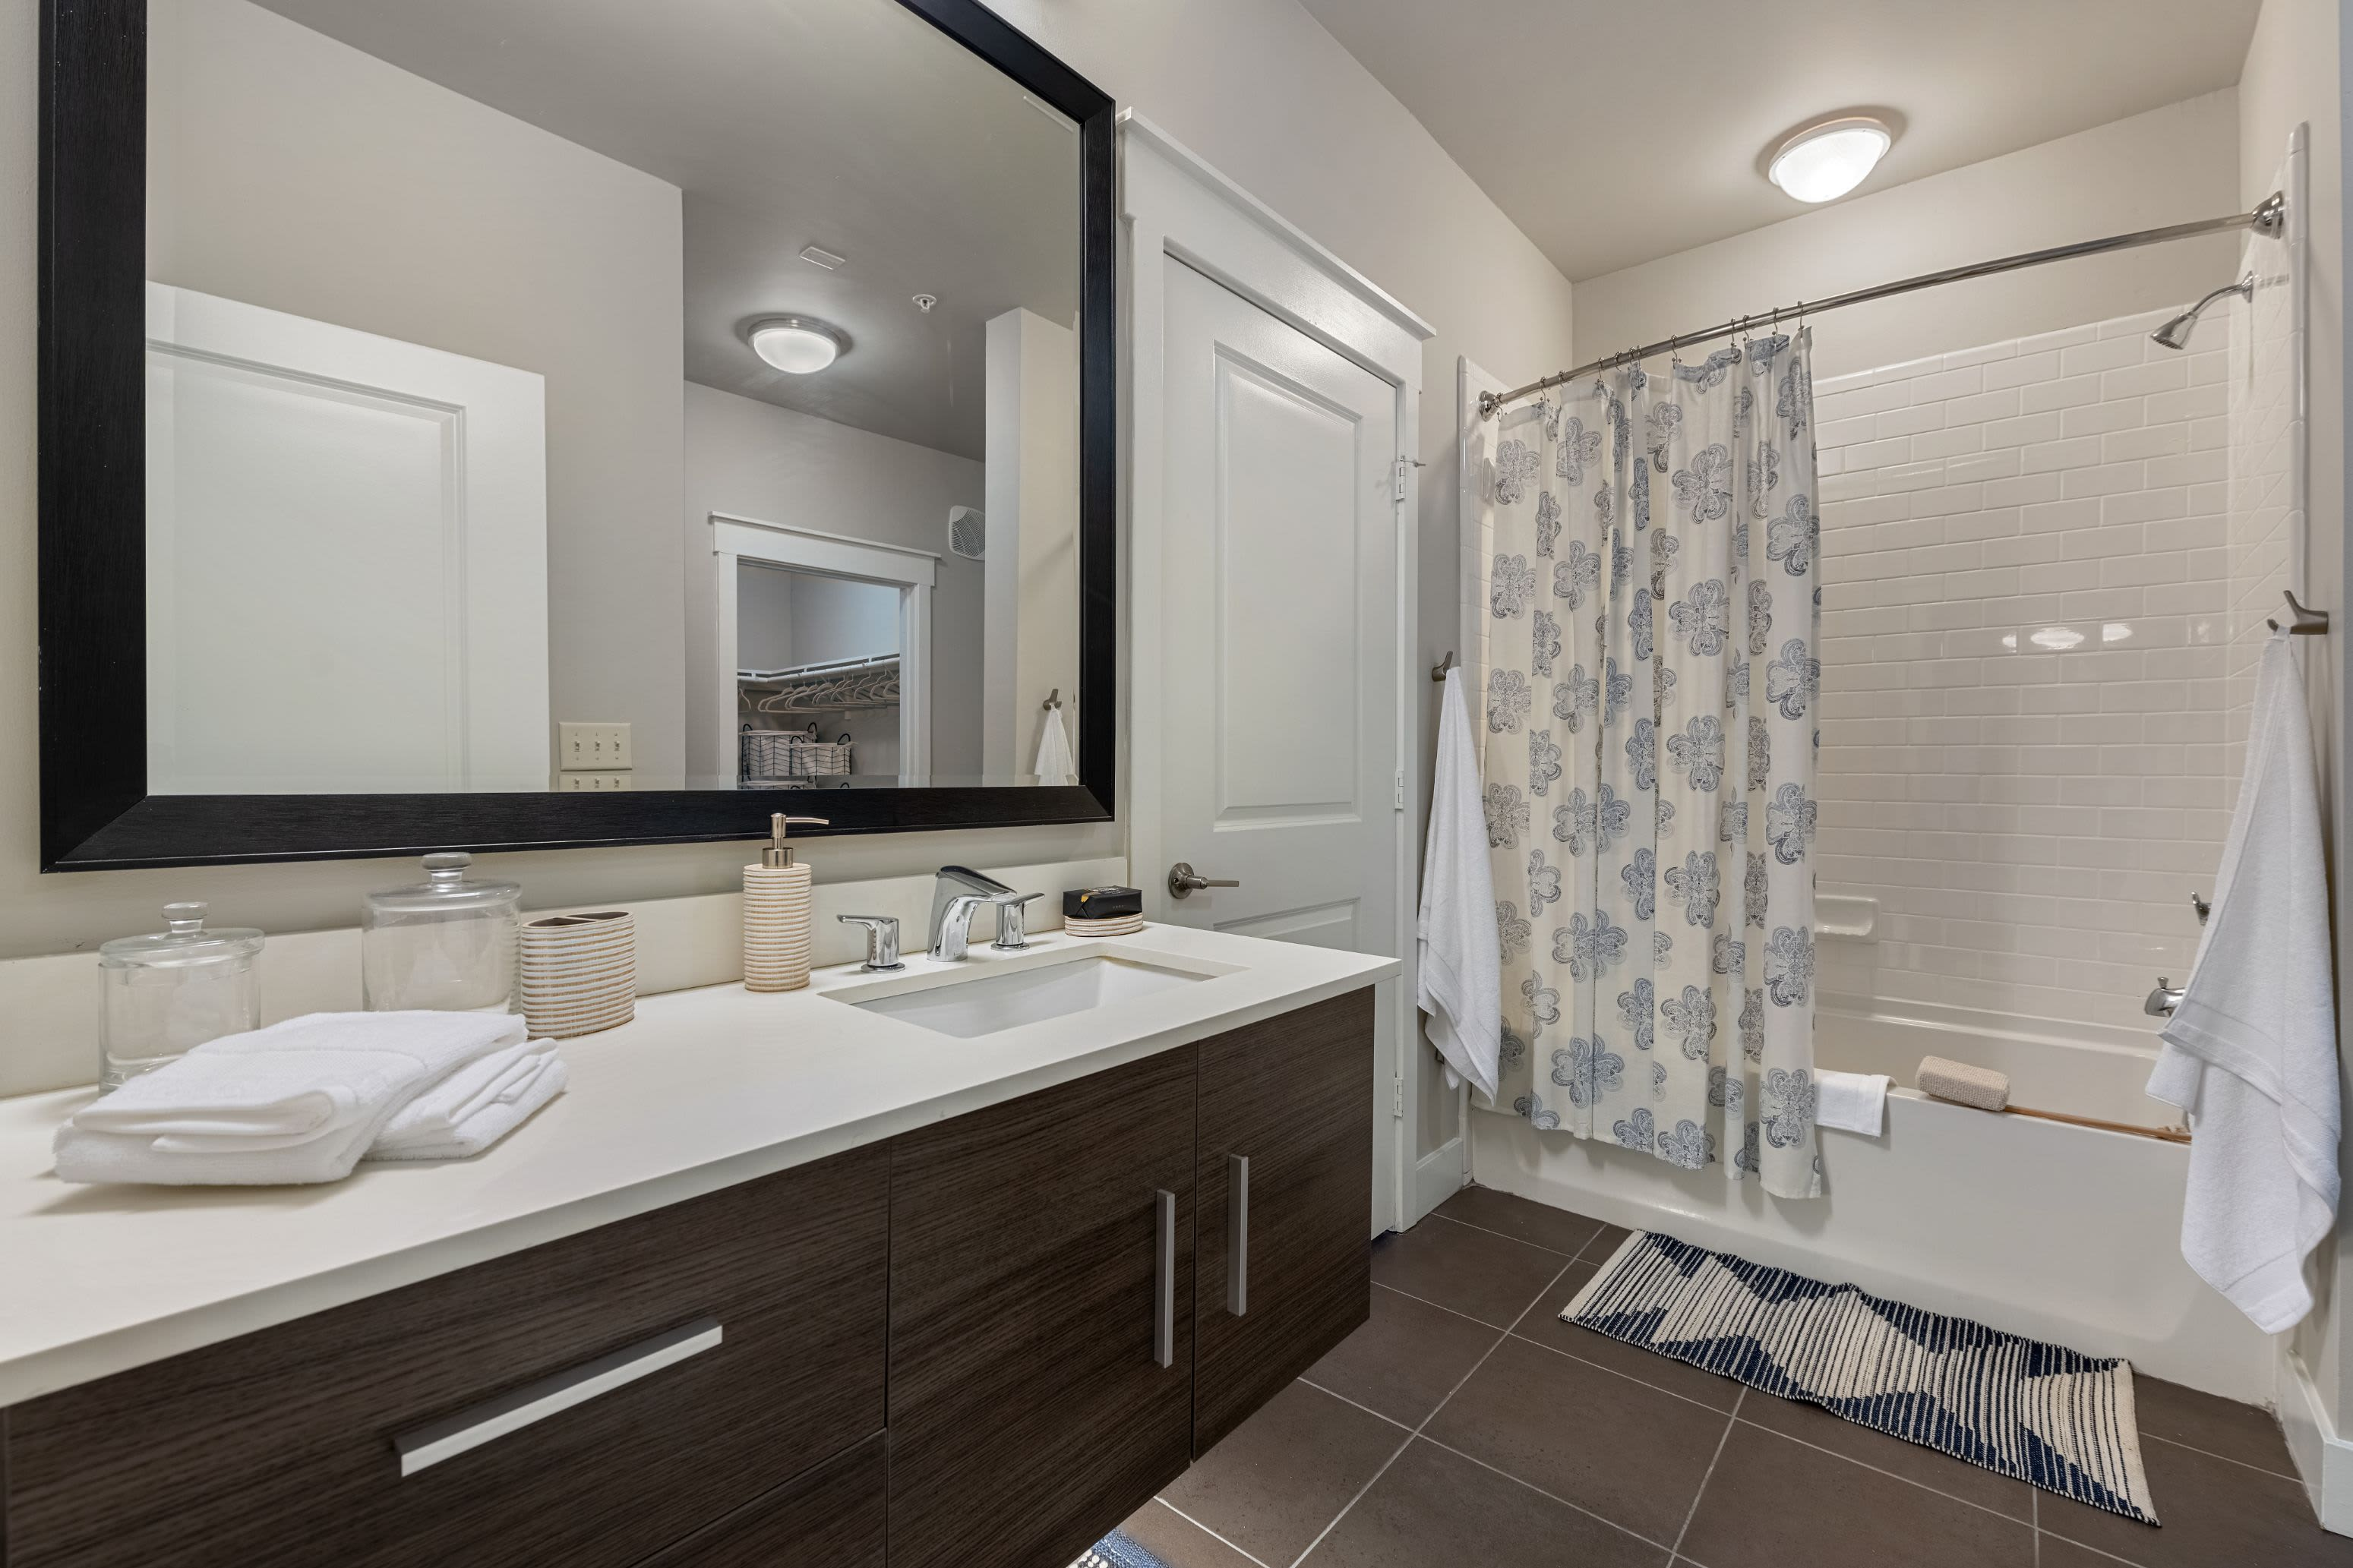 Bathroom with white countertops at Marquis Cresta Bella in San Antonio, Texas